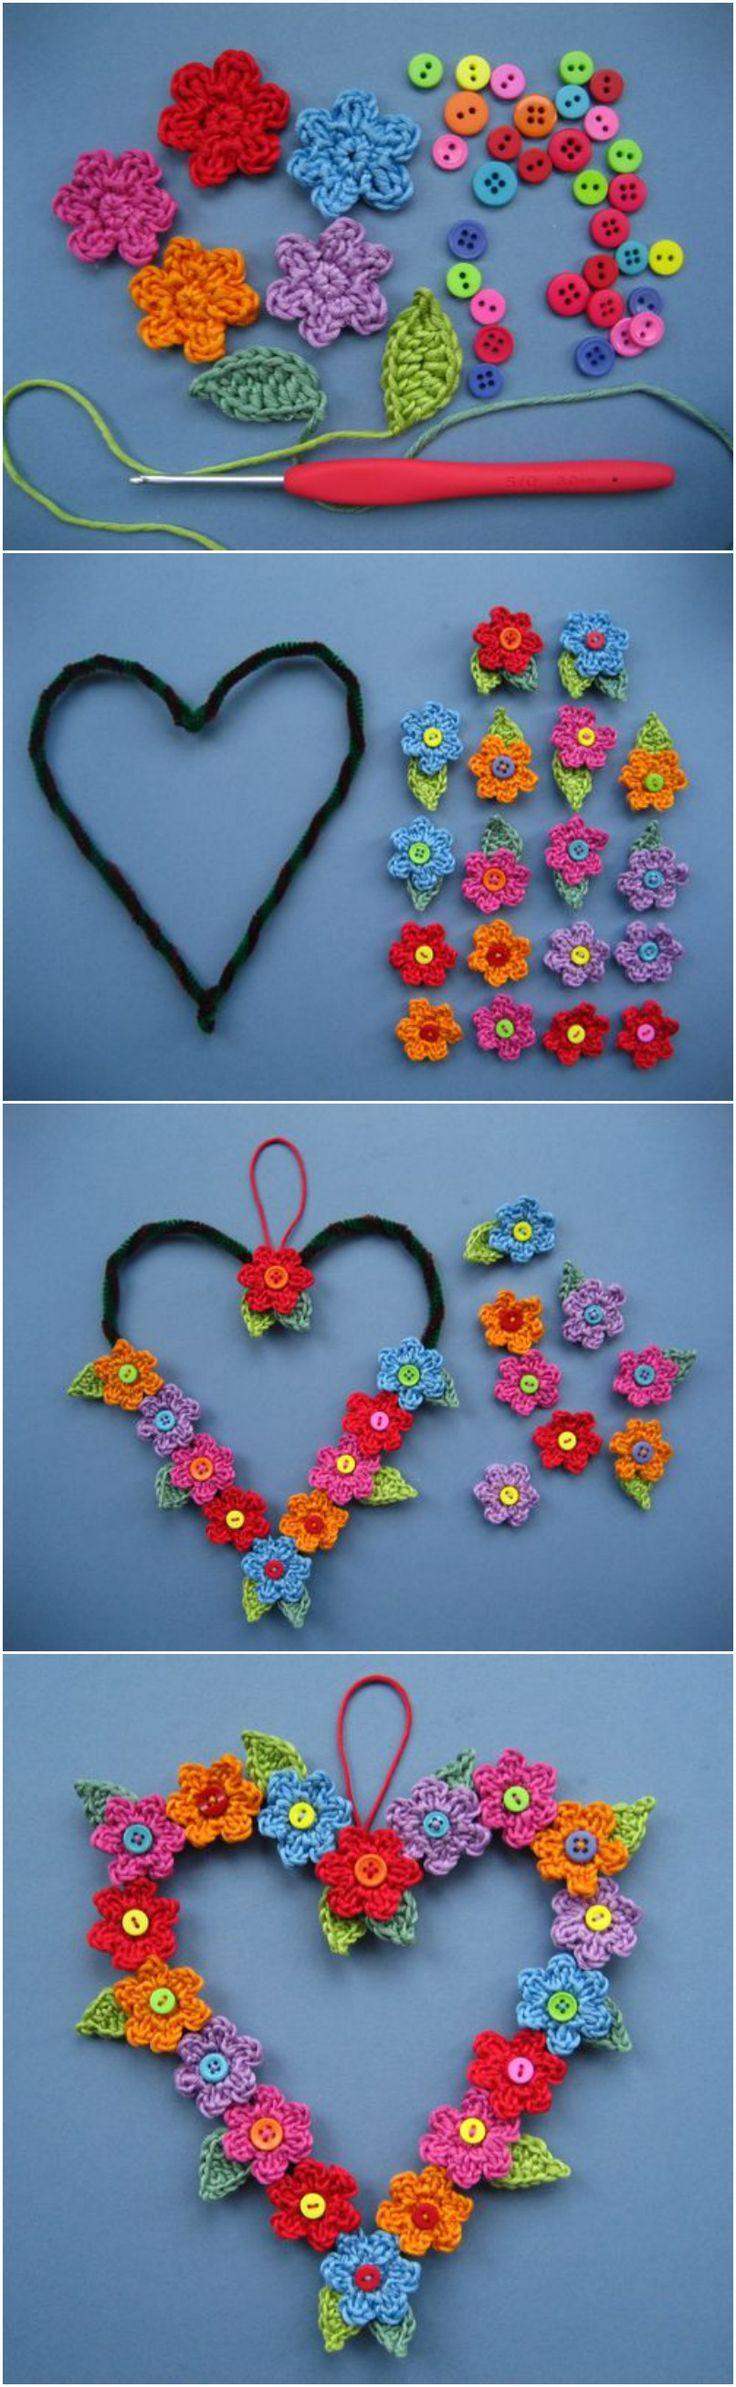 Corona en forma de corazon decorada con flores hechas en crochet! Ideal para decorar puertas o paredes! :) ♥ https://www.pinterest.com/LeoncitosLocos/